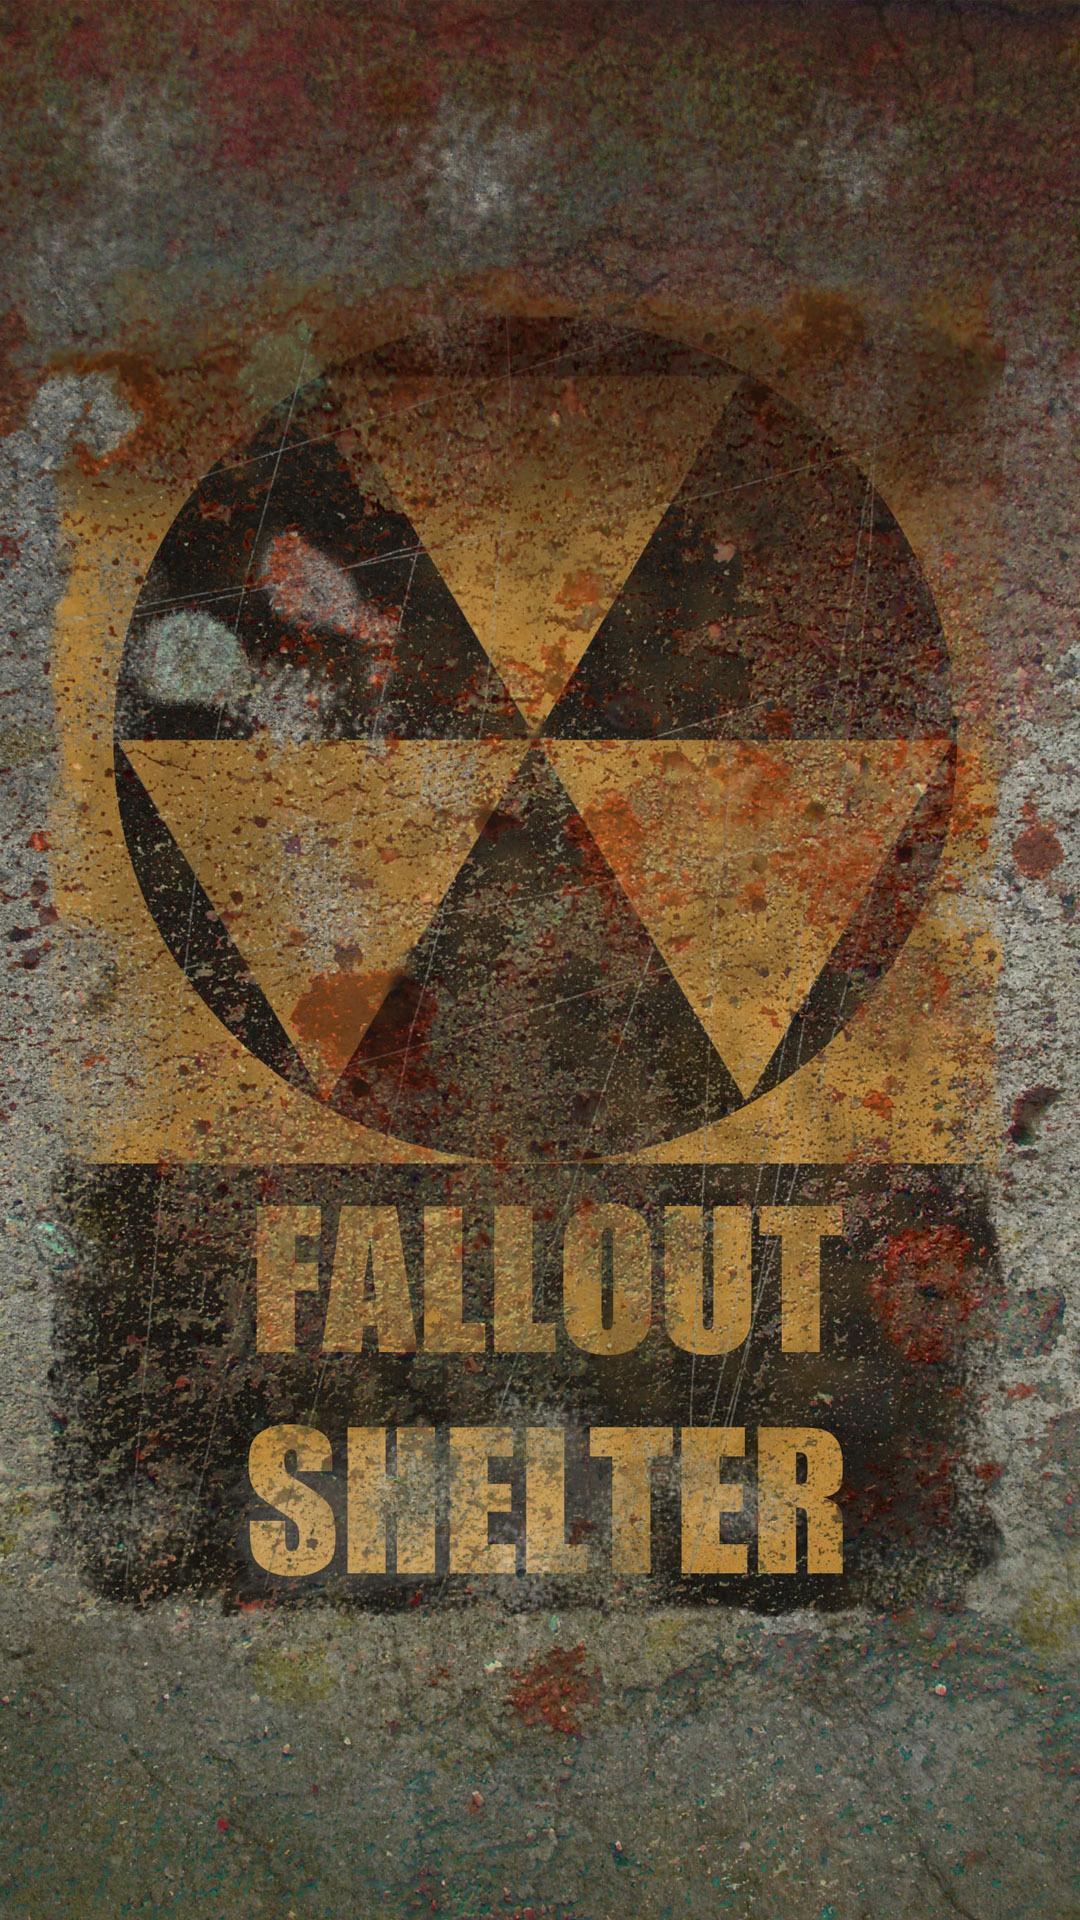 44 Fallout 4 Mobile Wallpaper On Wallpapersafari